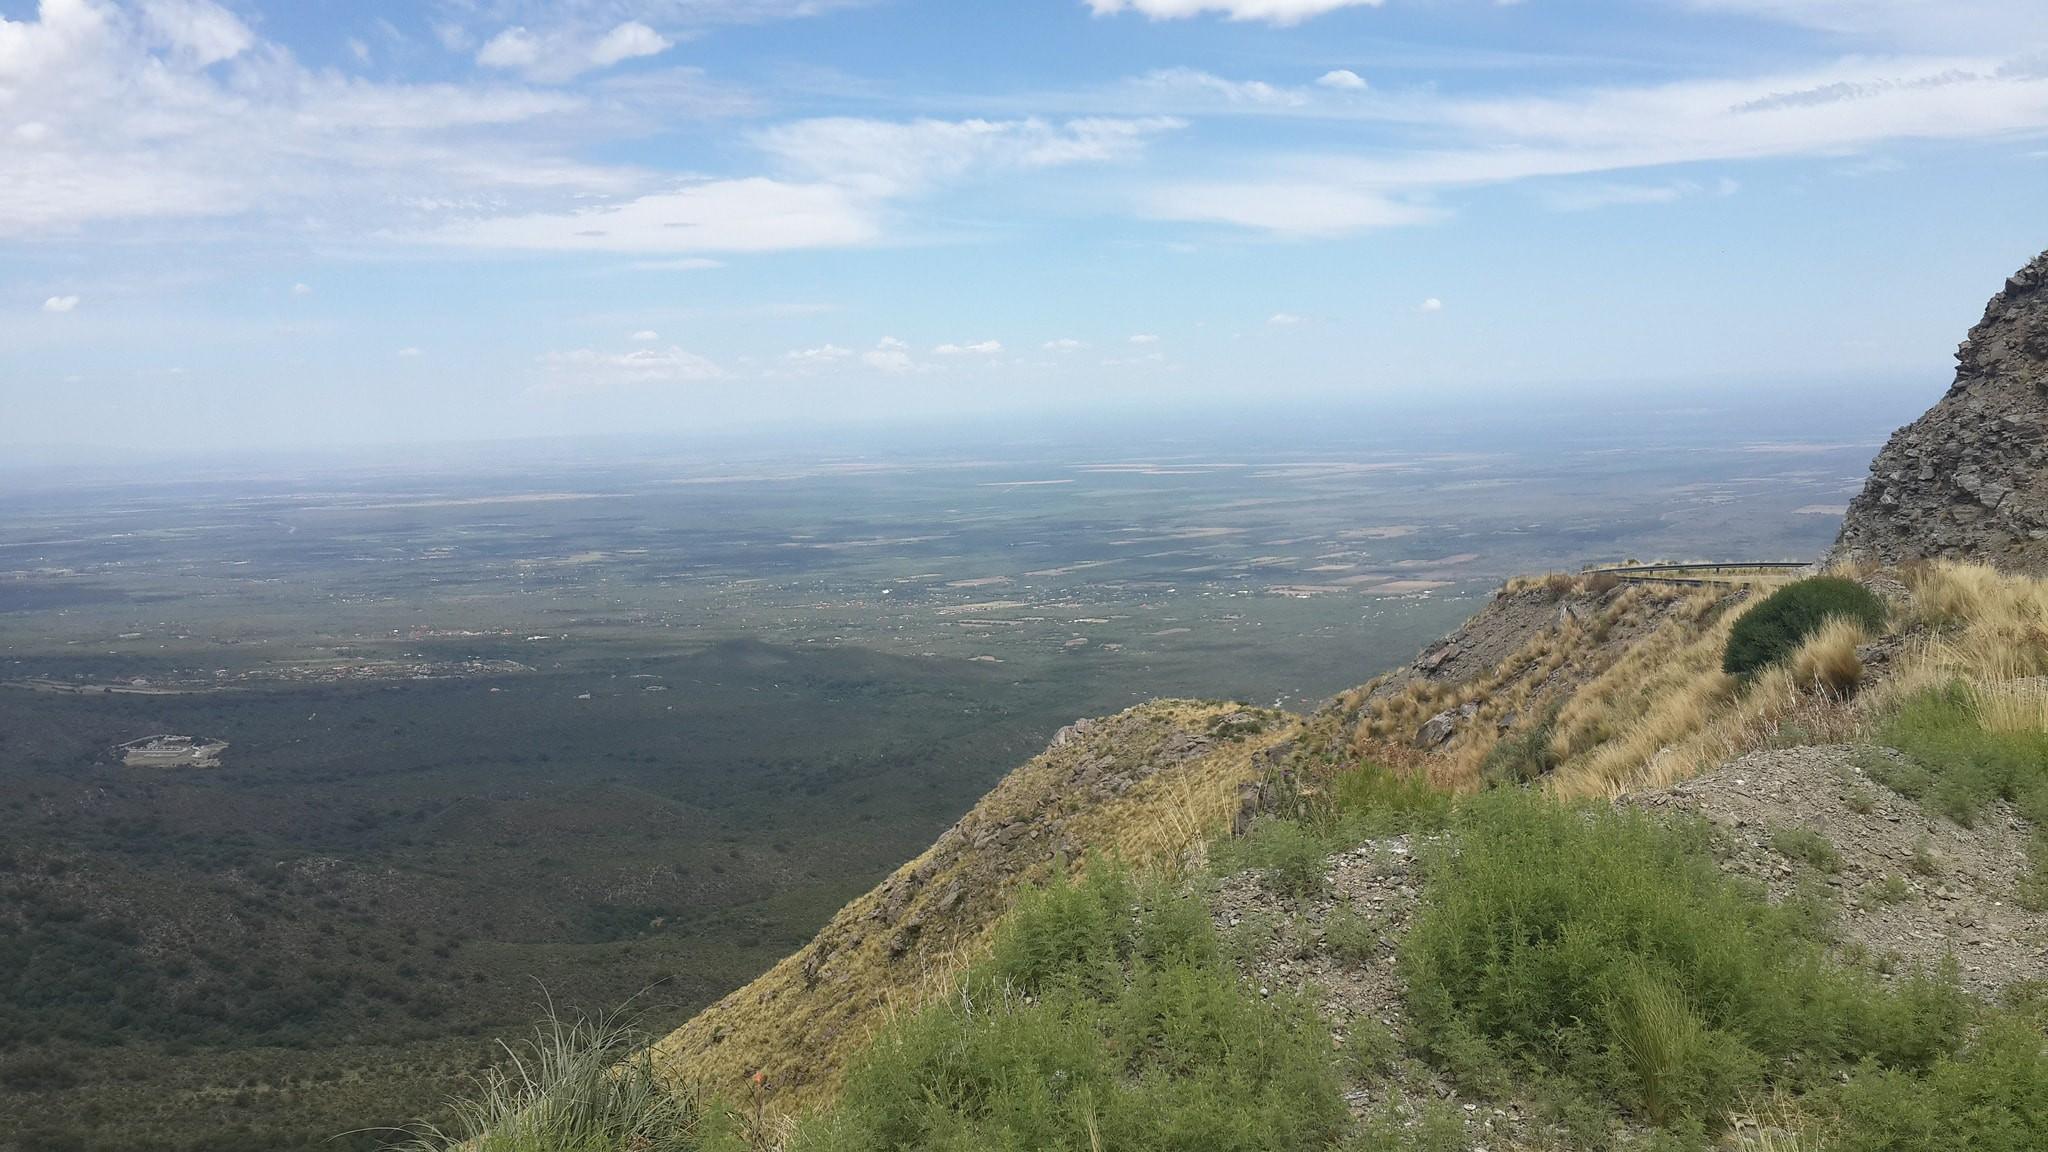 Scenes of nature in San Luis